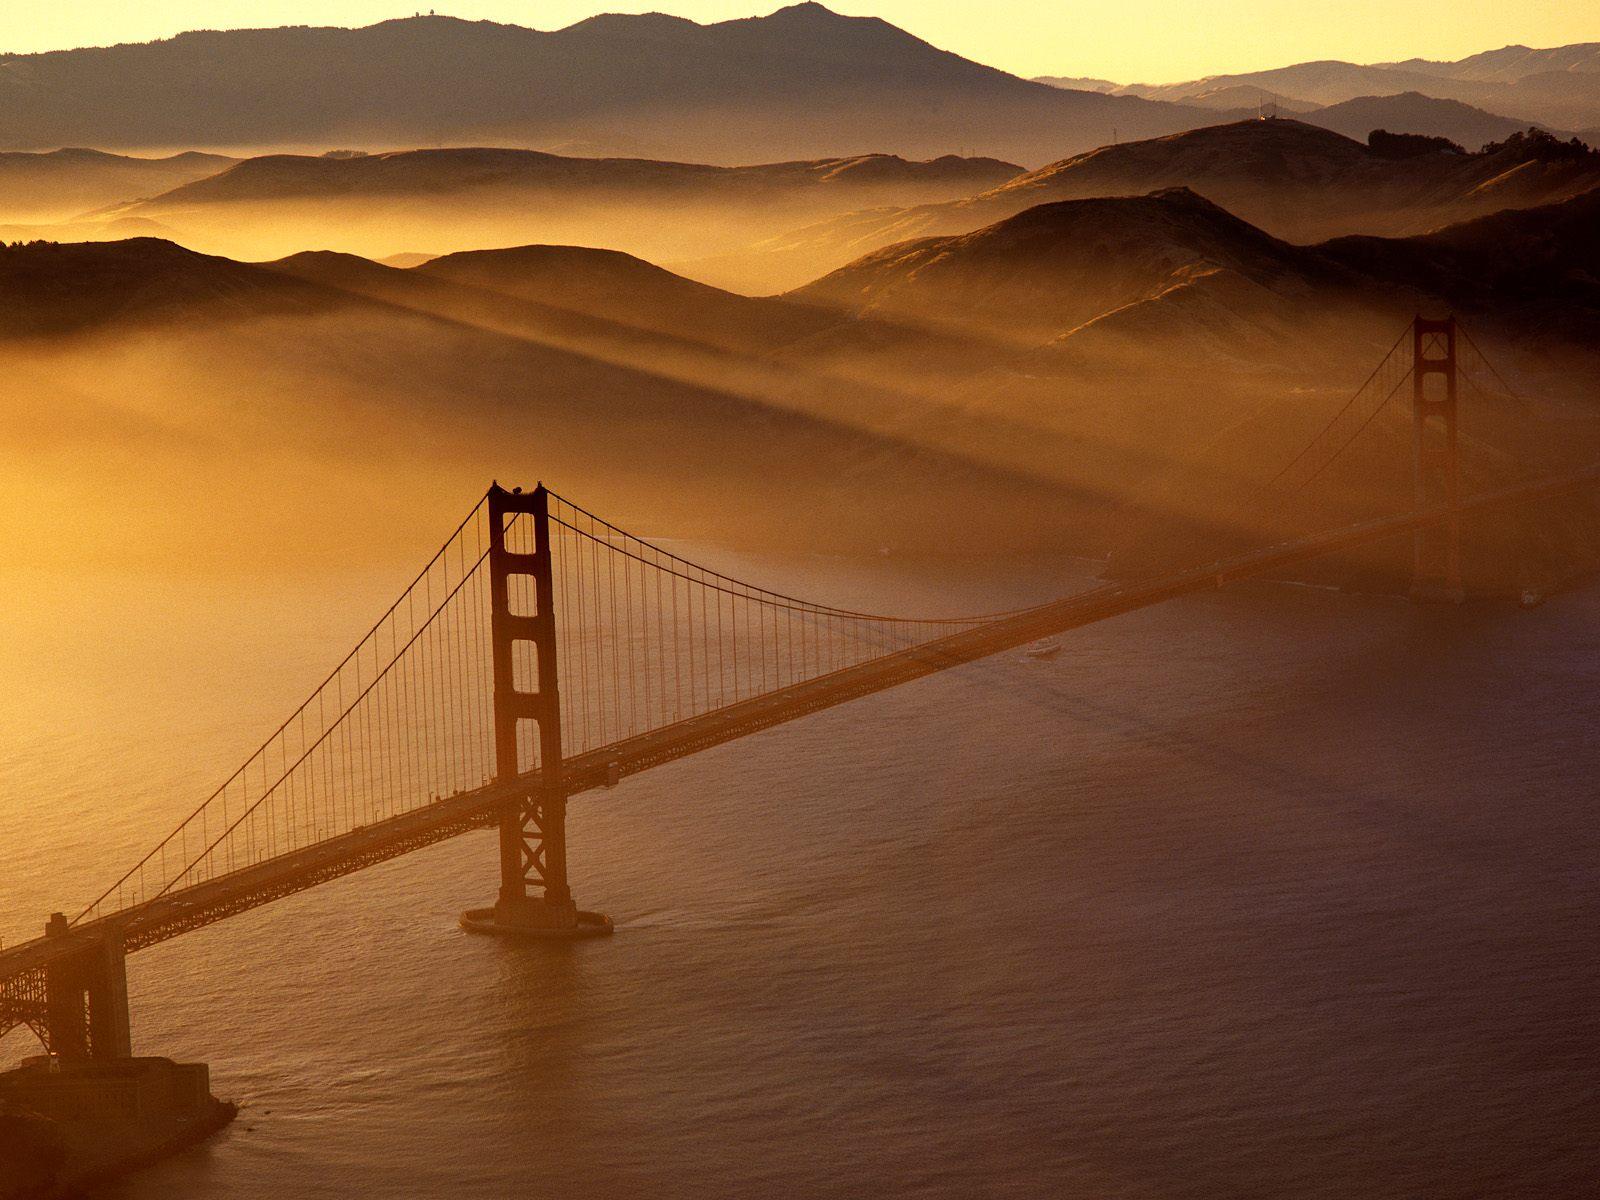 Headlands san francisco california usa wallpapers and images